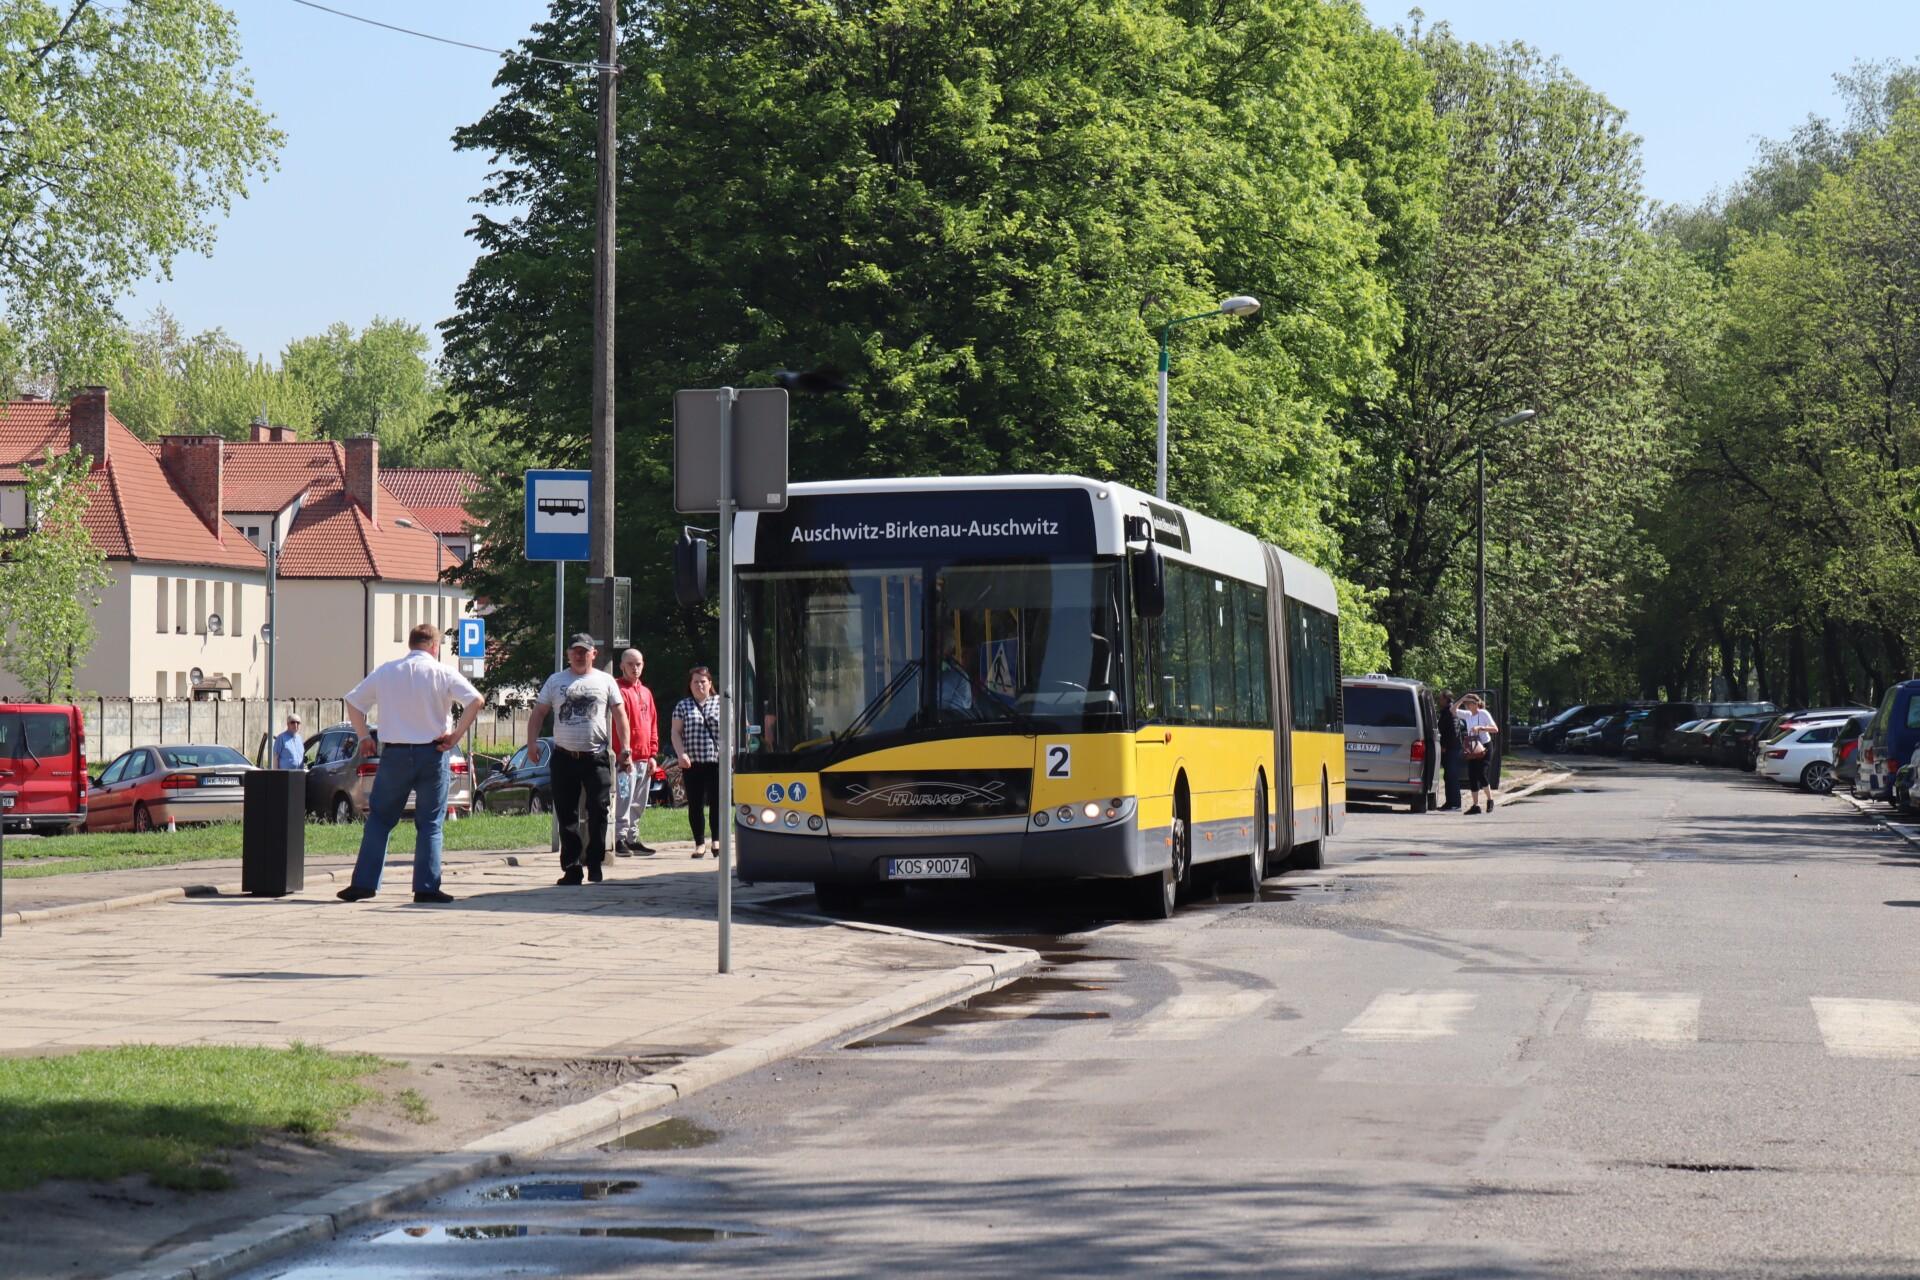 Gratis shuttlebus mellem Auschwitz og Birkenau